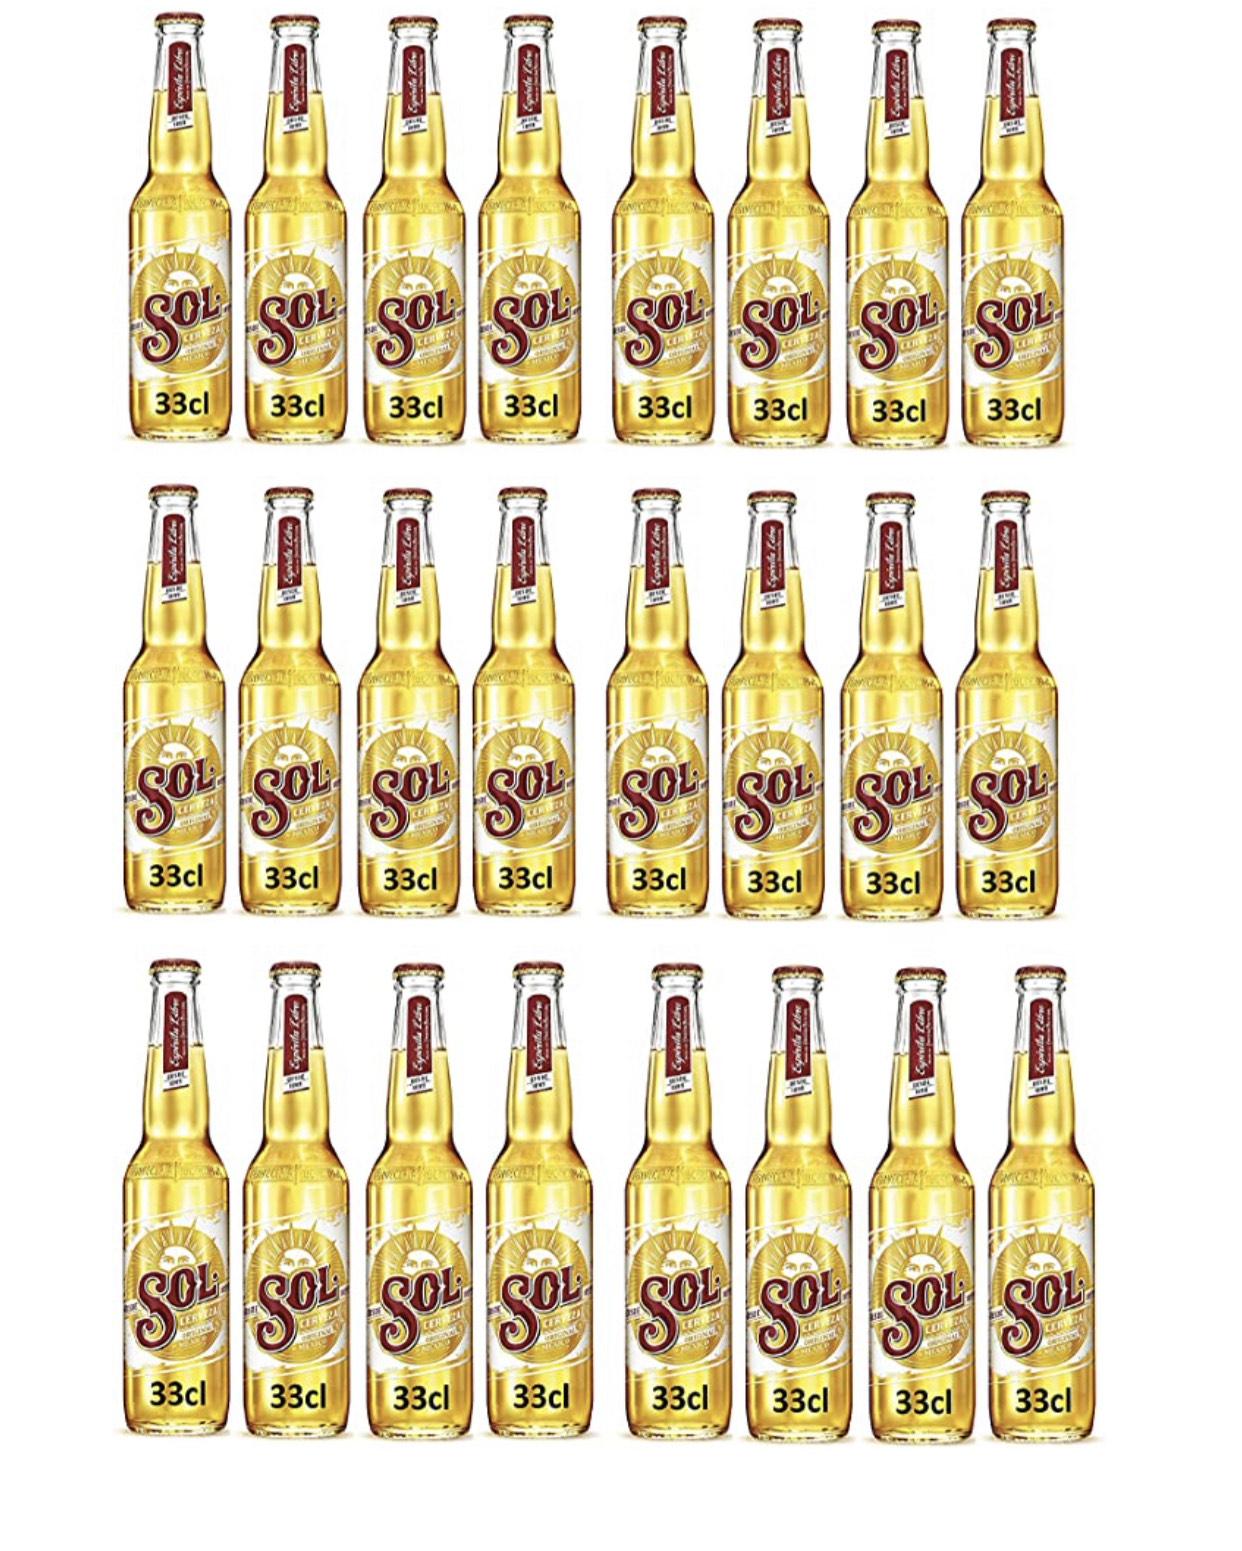 Cerveza sol 33cl